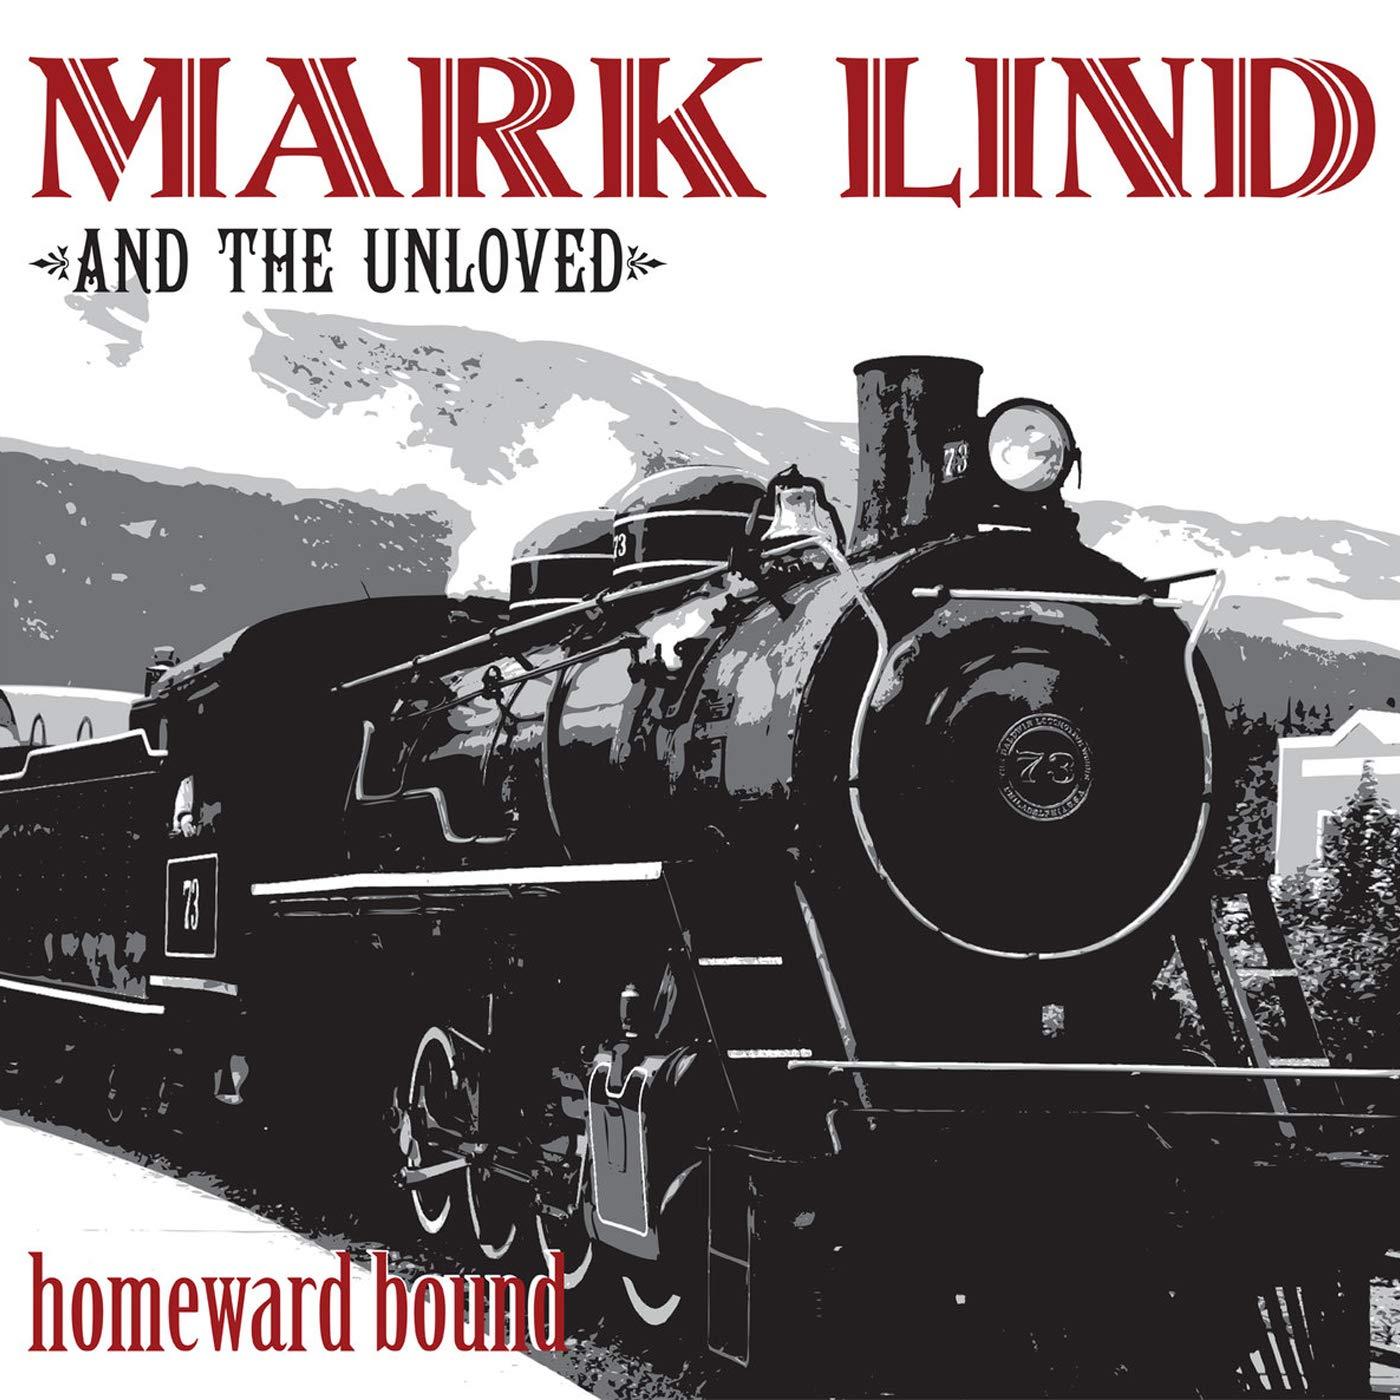 Vinilo : MARK LIND & THE UNLOVED - Homeward Bound (LP Vinyl)